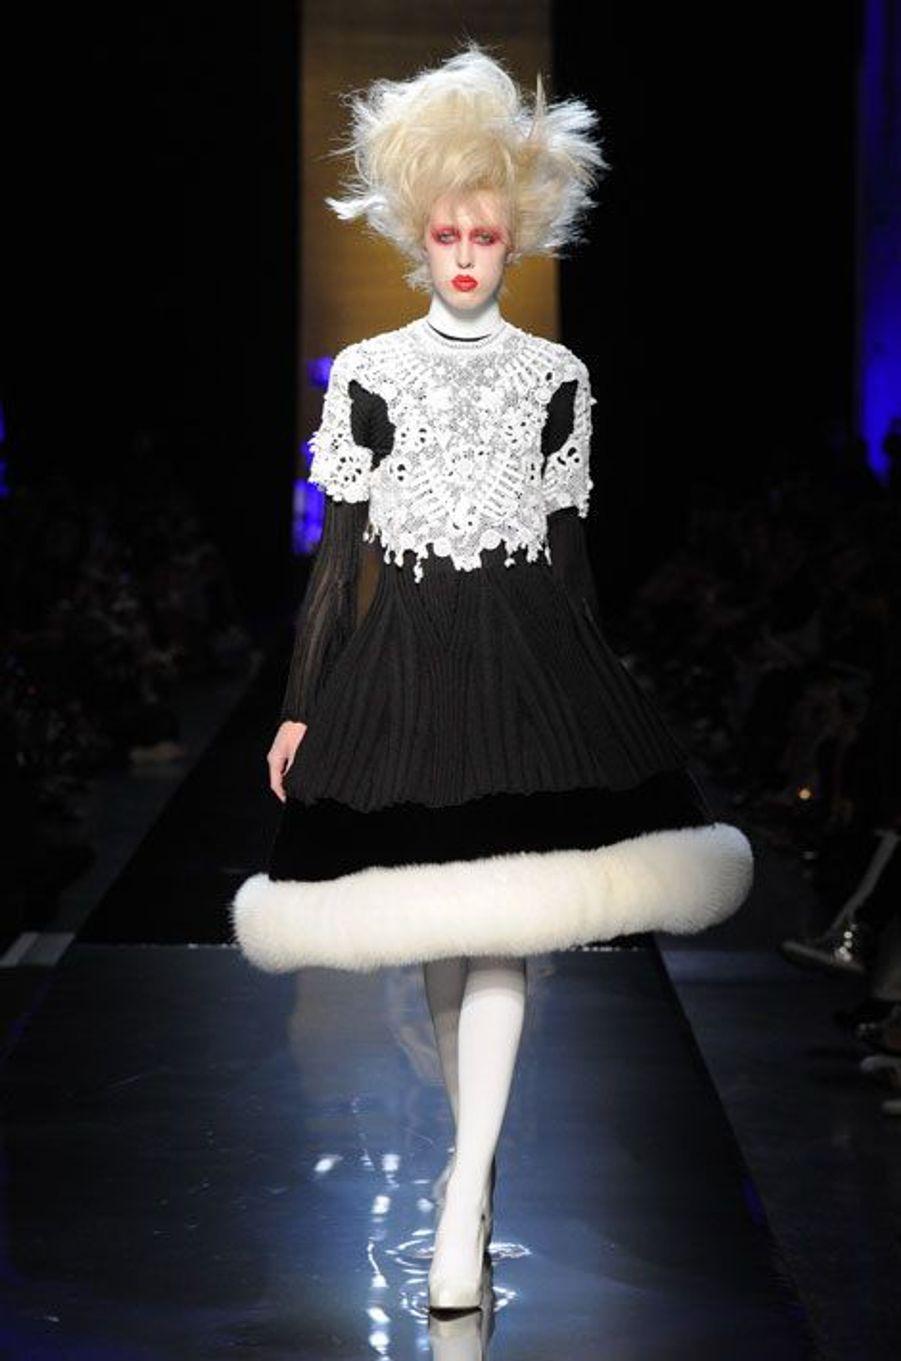 Conchita Wurst vampirise Jean-Paul Gaultier